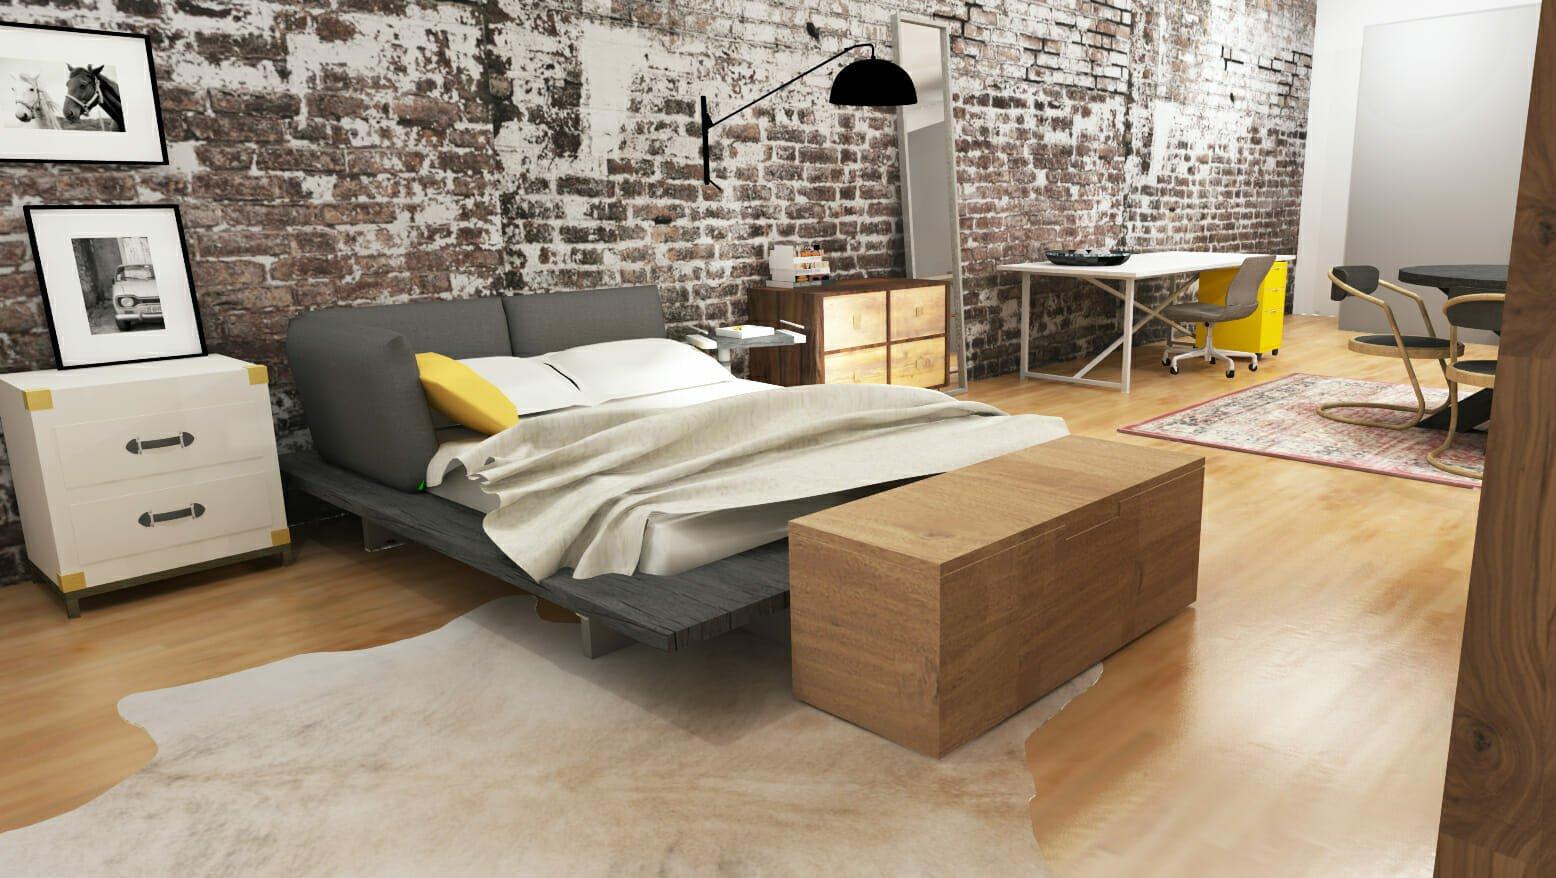 Studio NYC loft interior design with exposed brick walls